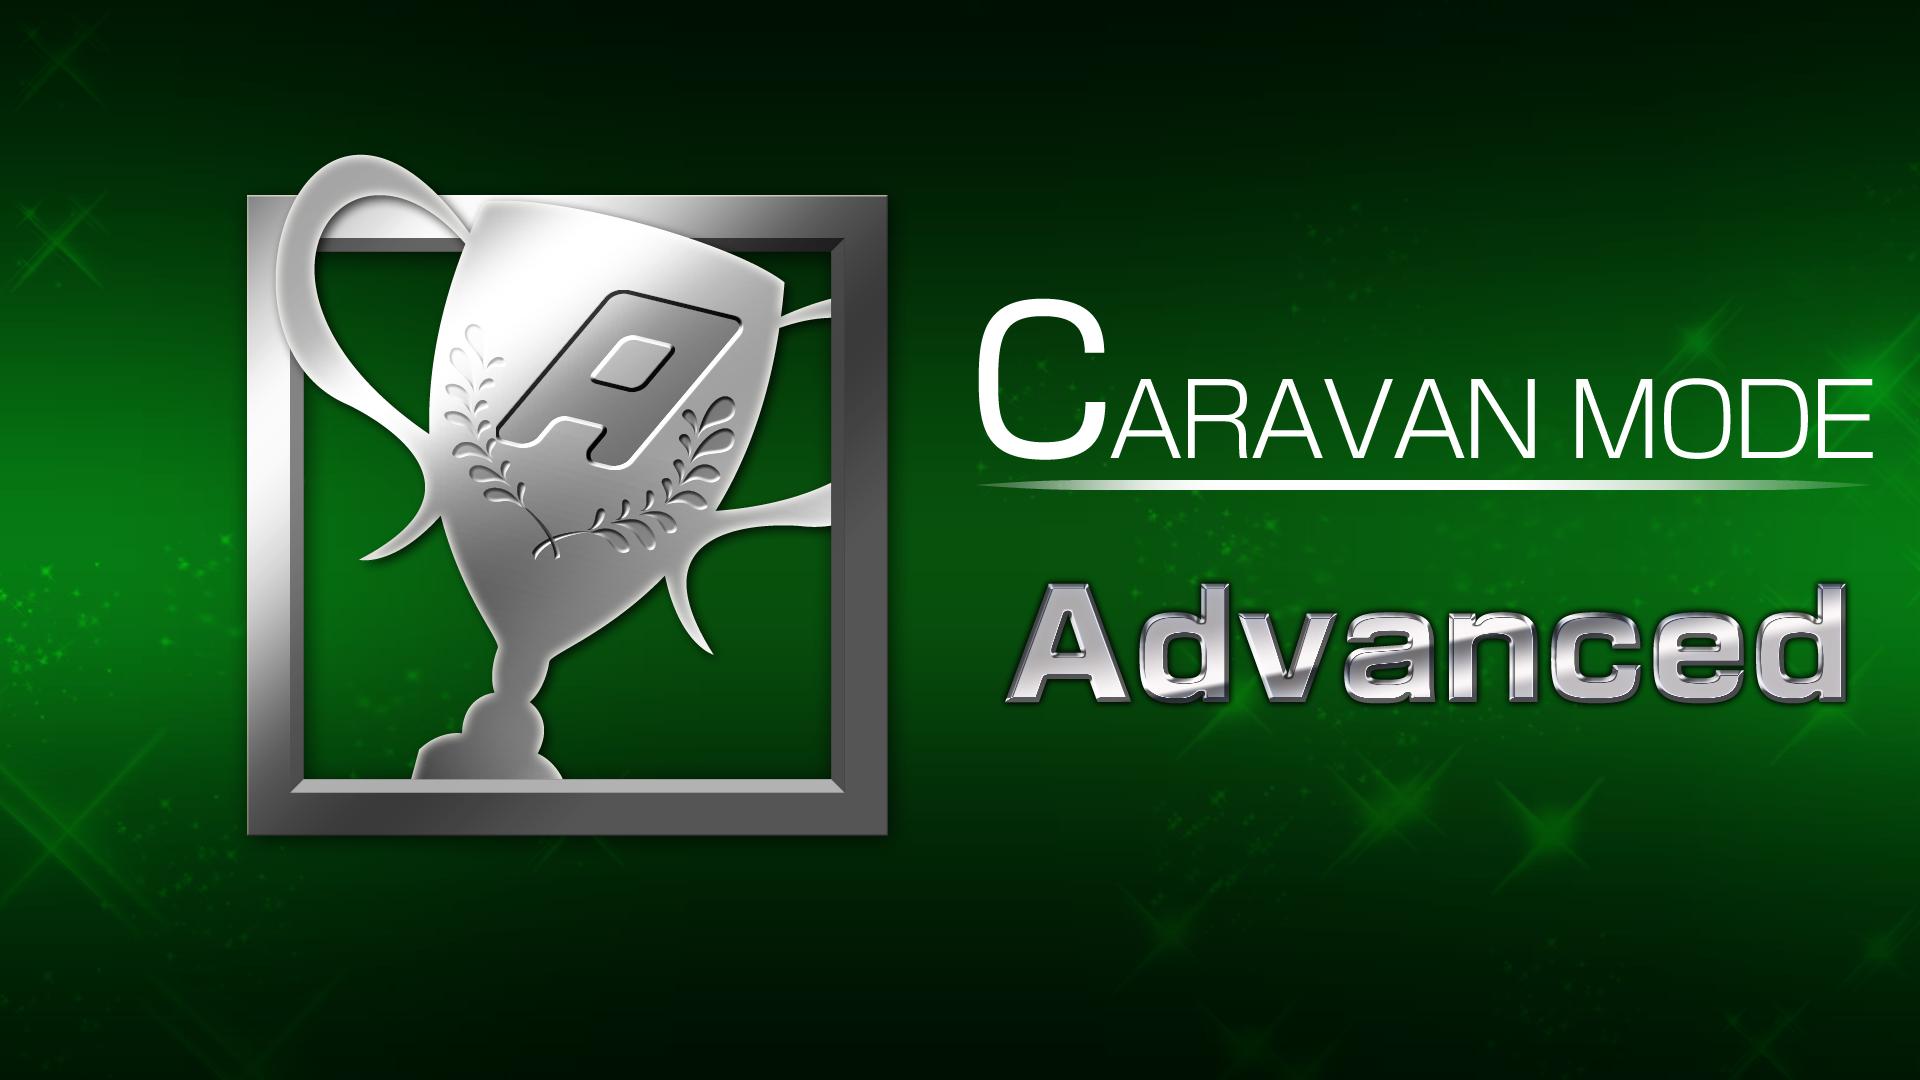 Icon for CARAVAN MODE 2 points